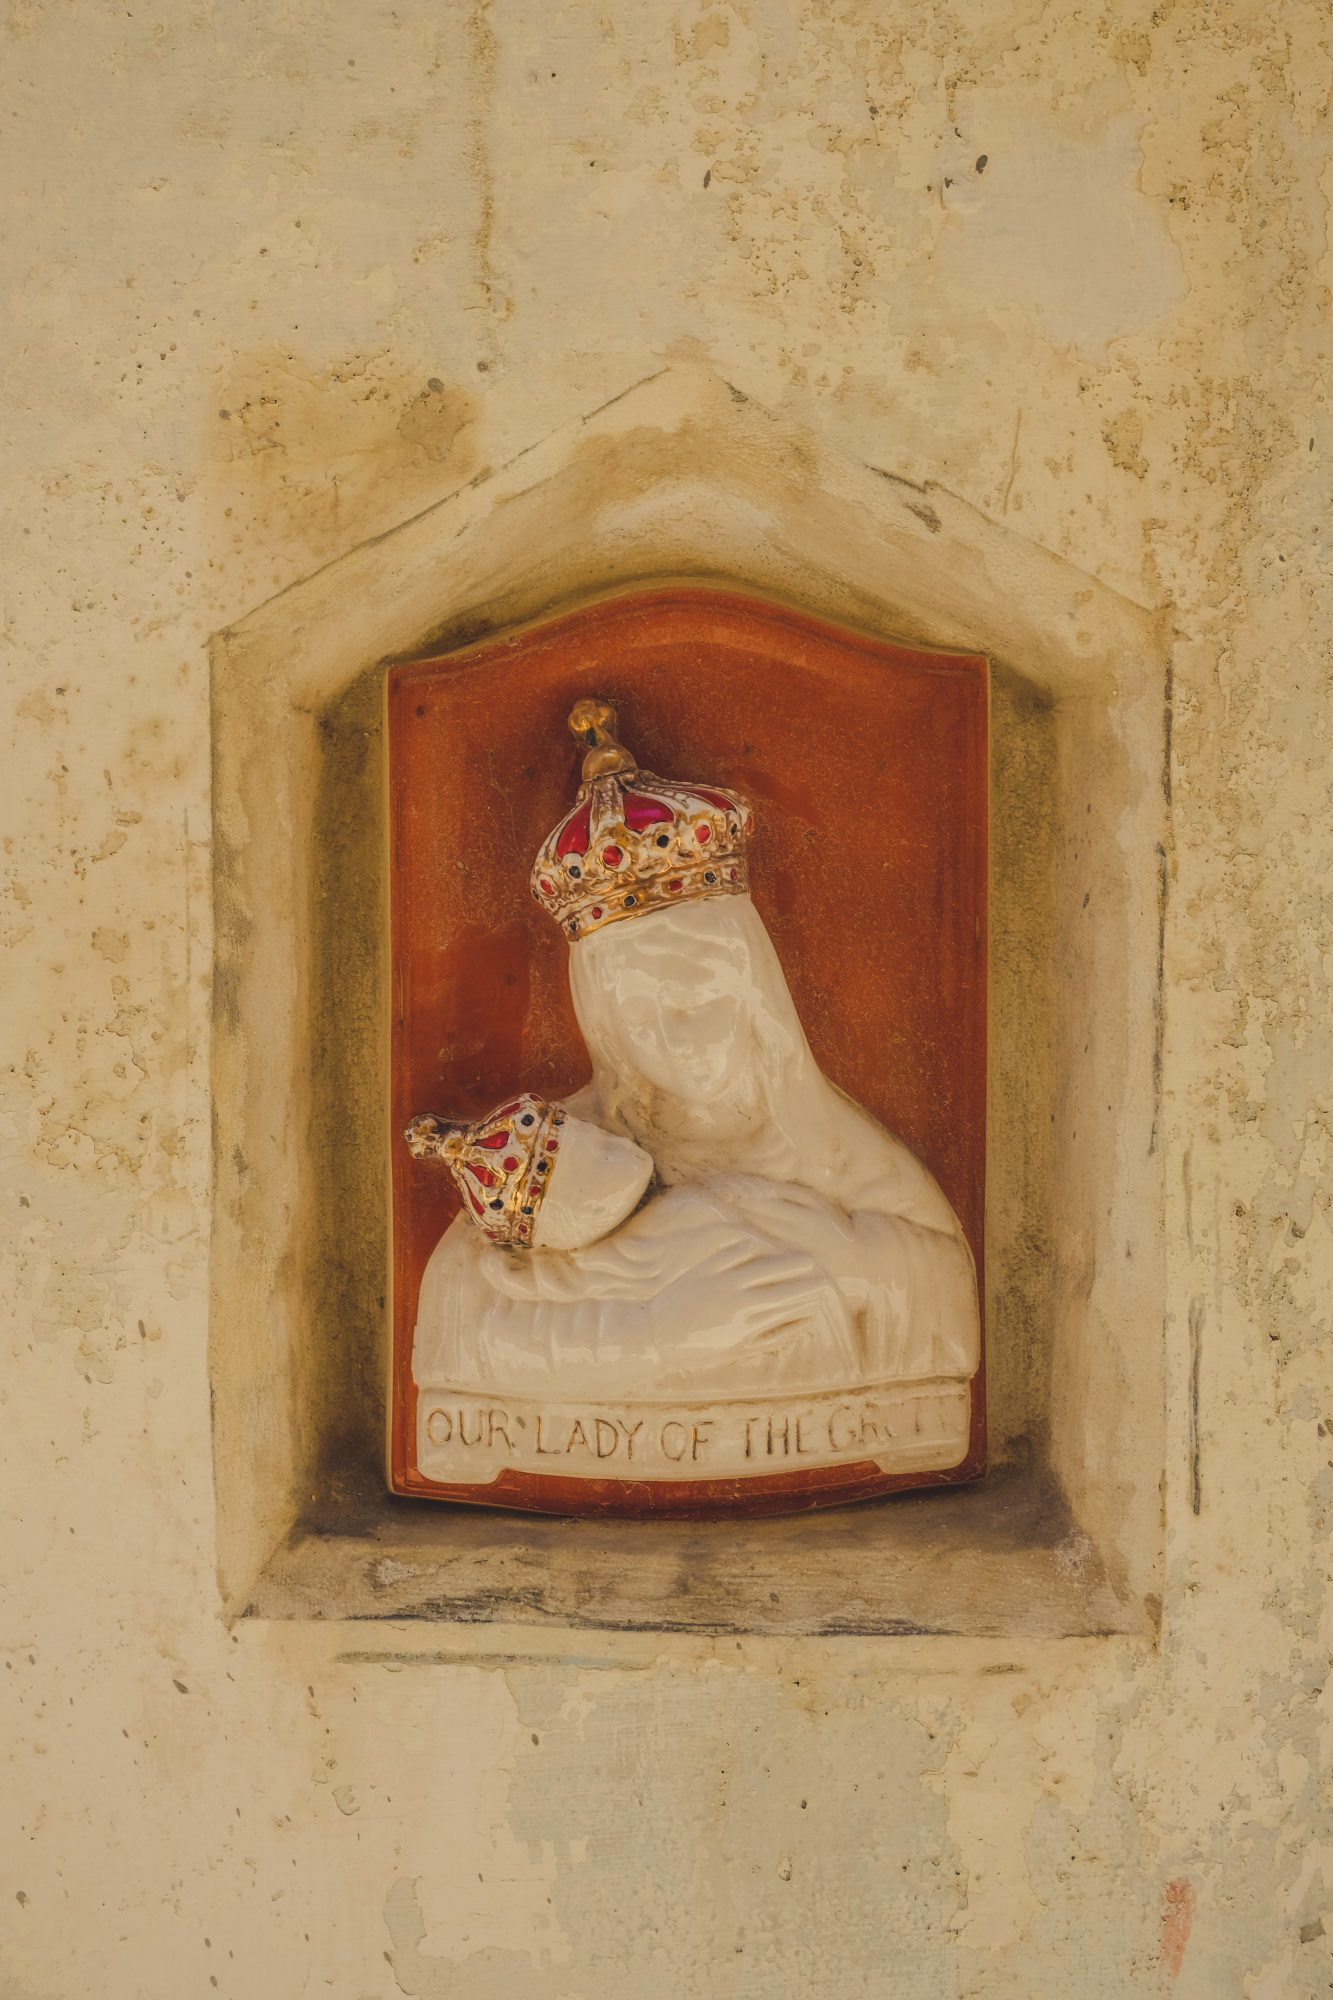 St Patron de maison - Ir-Rabat Gozo Malte